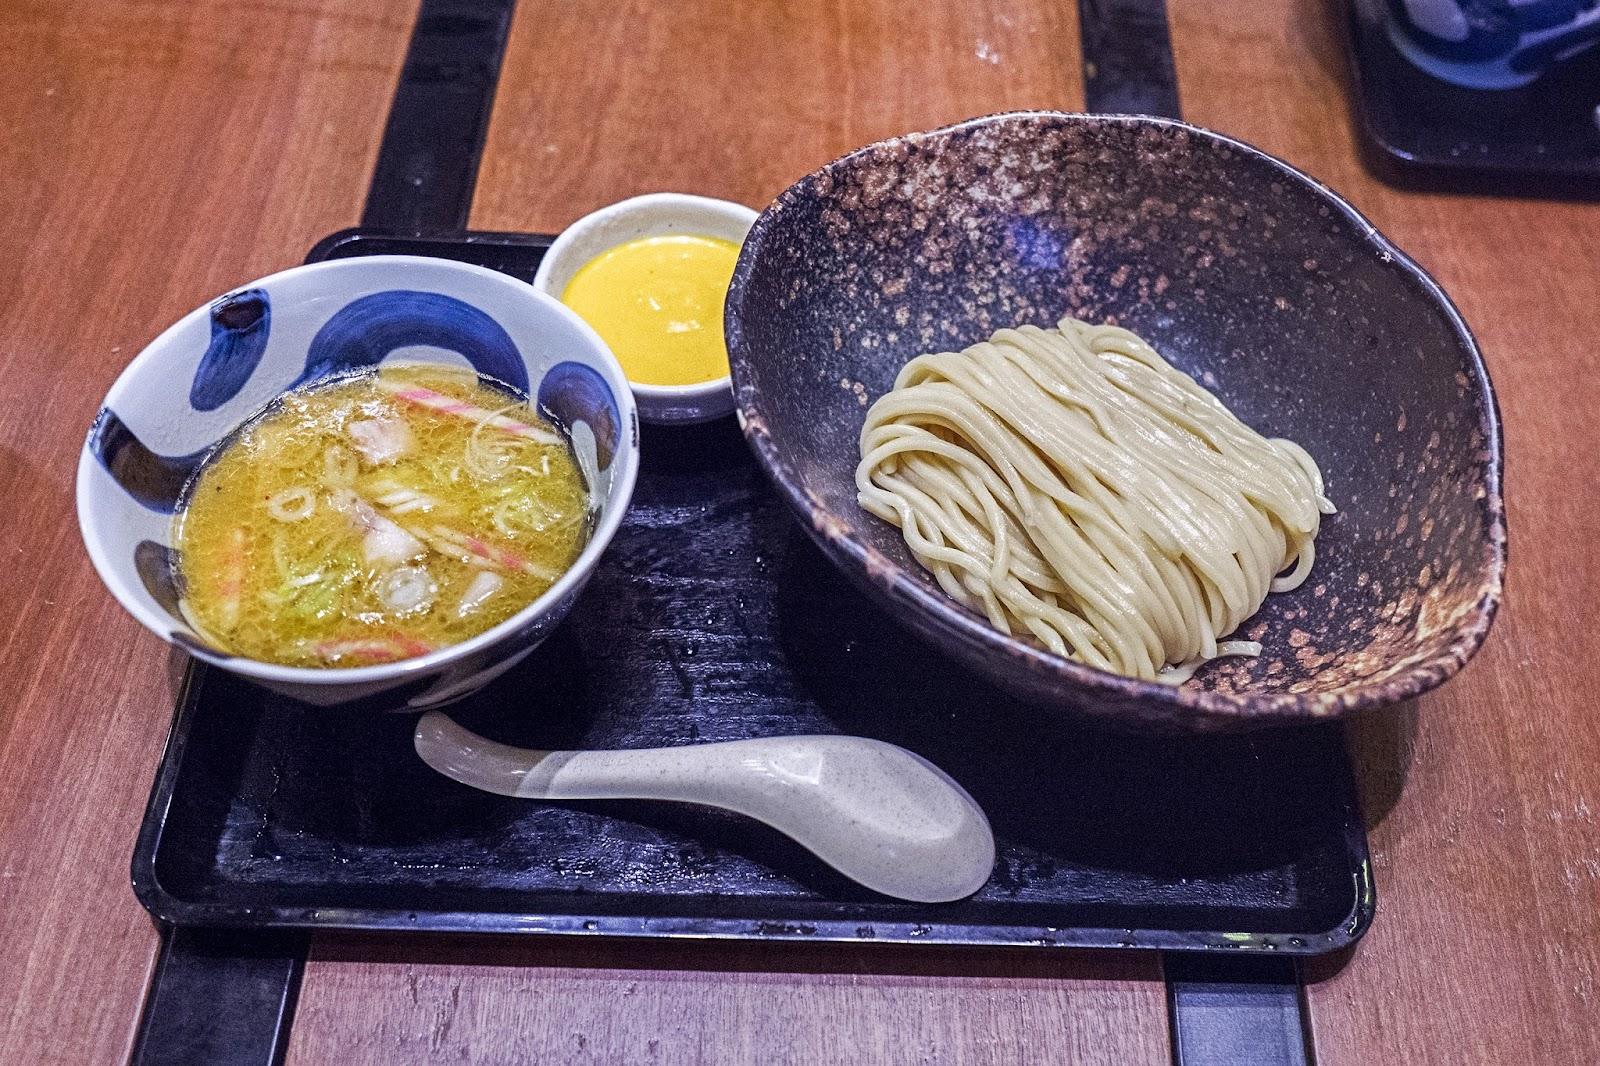 f-cheese-L1050810.jpg